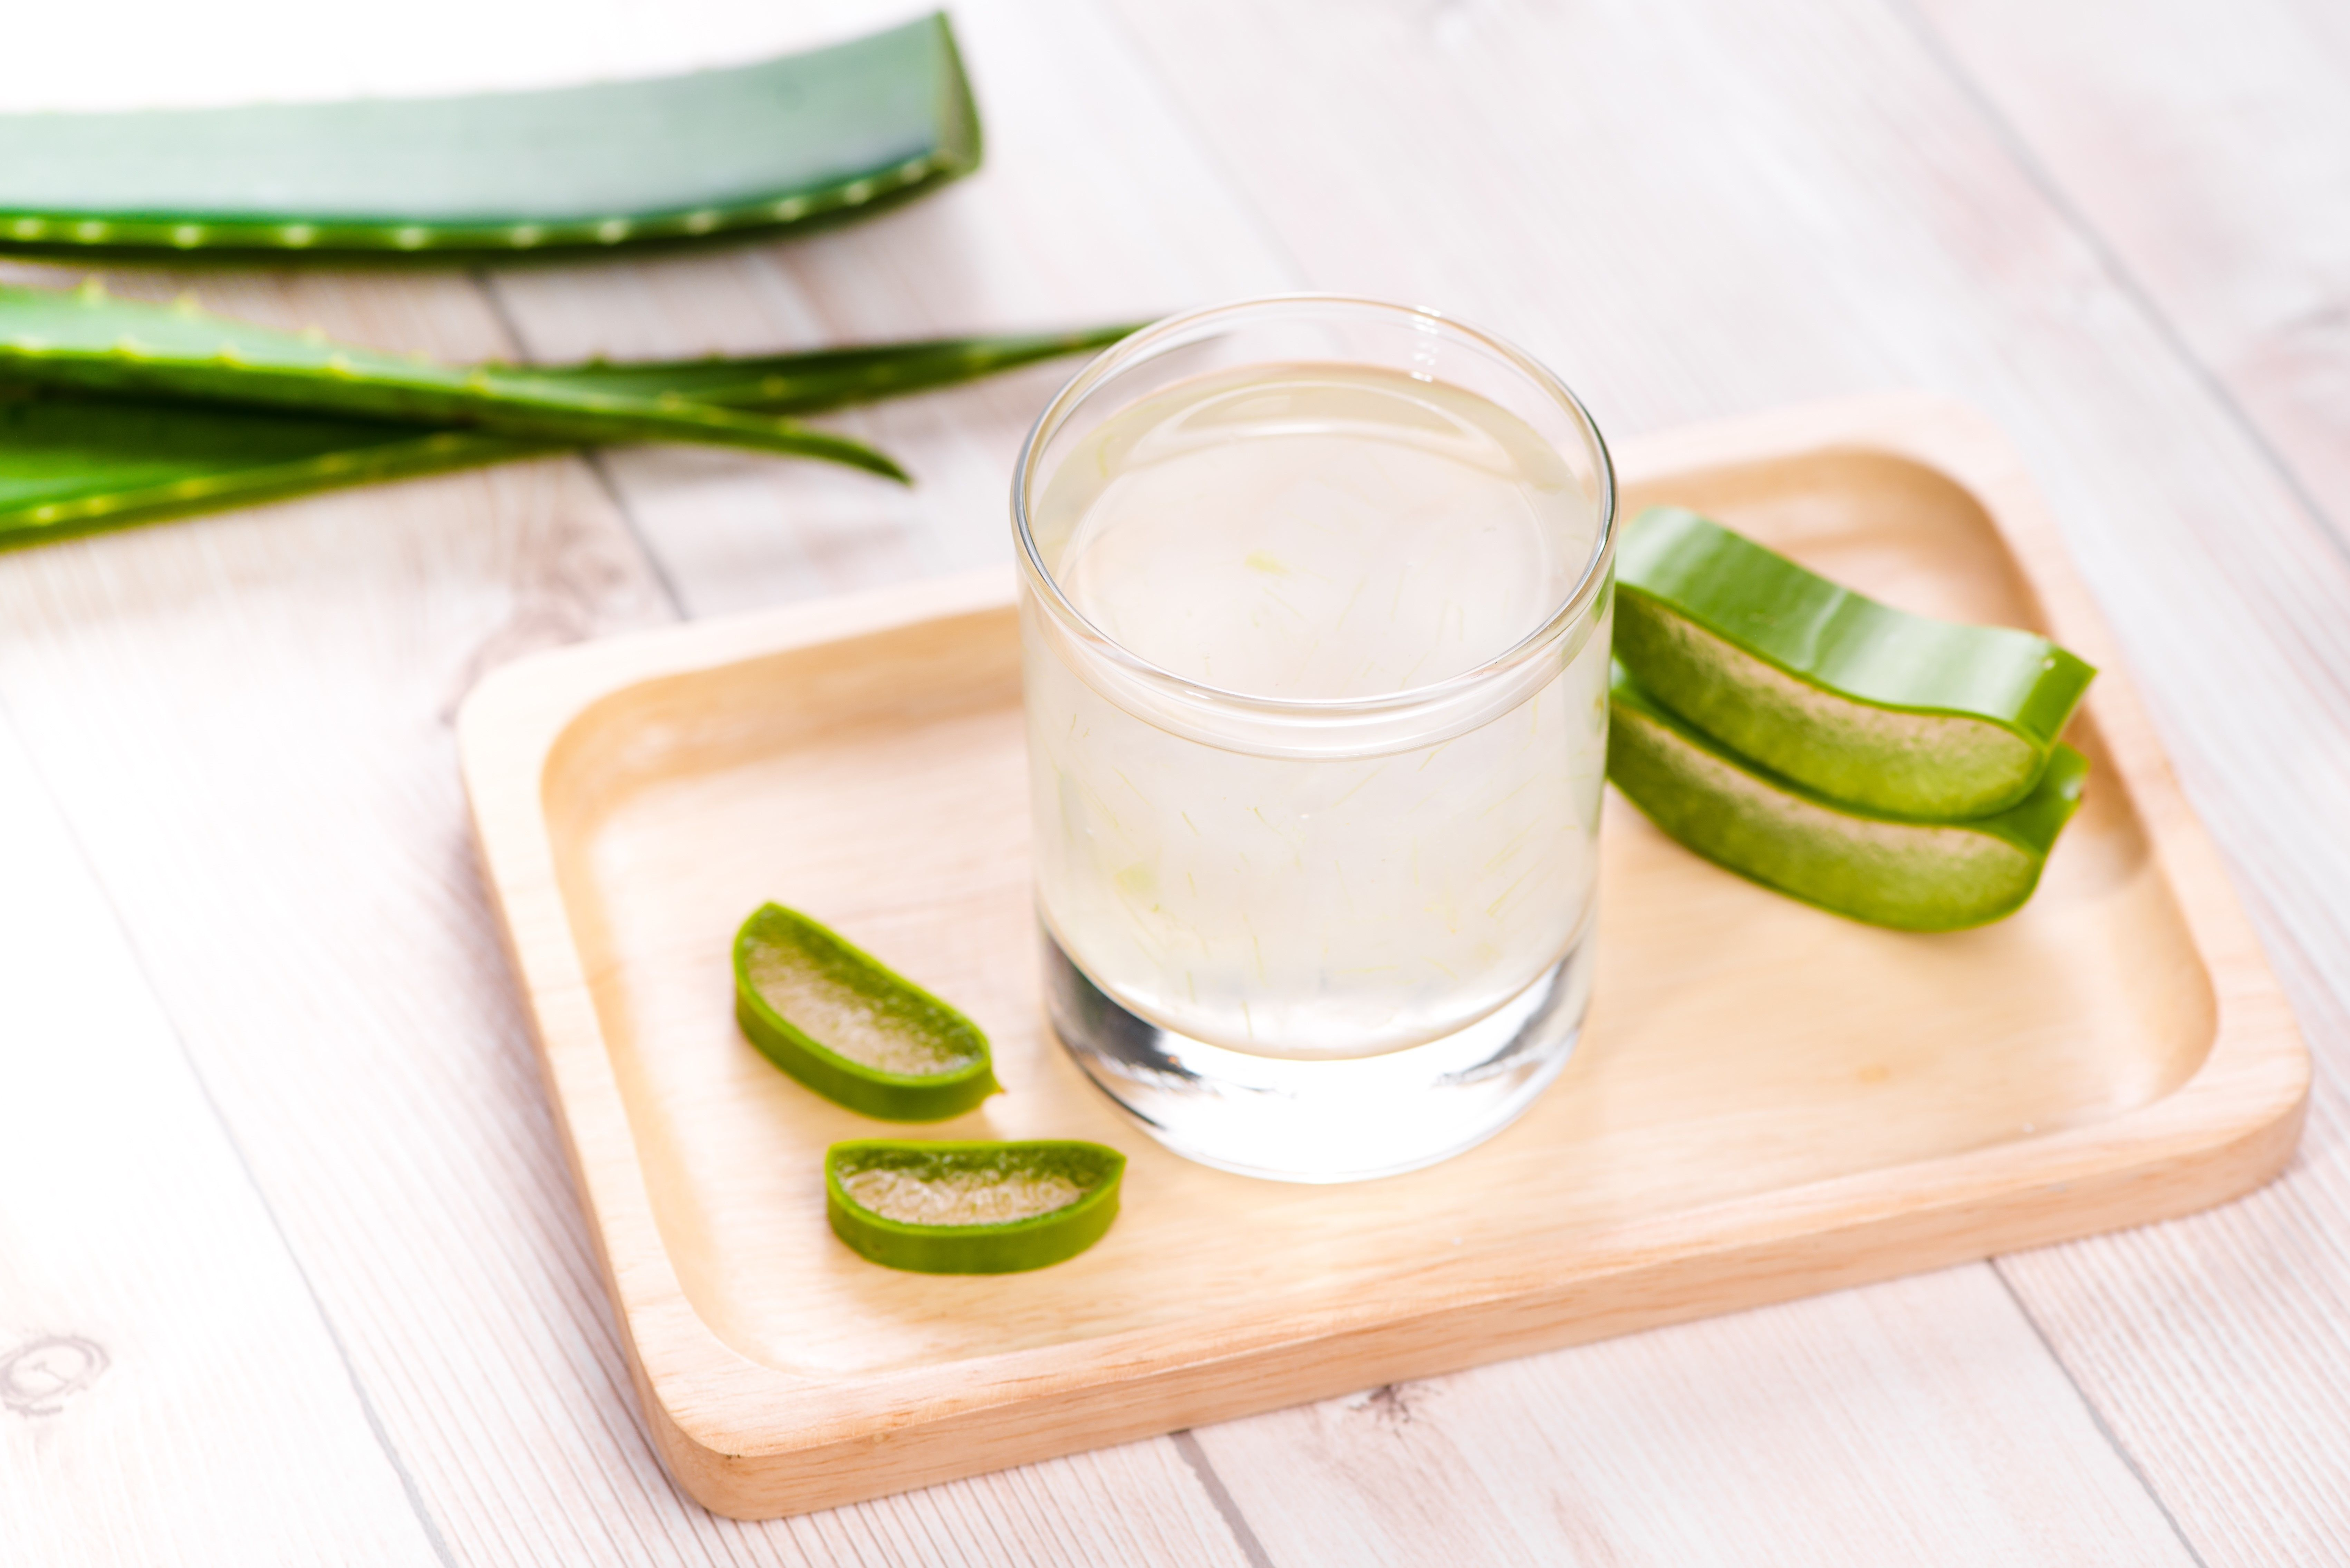 10 amazing benefits of aloe vera how to make aloe juice